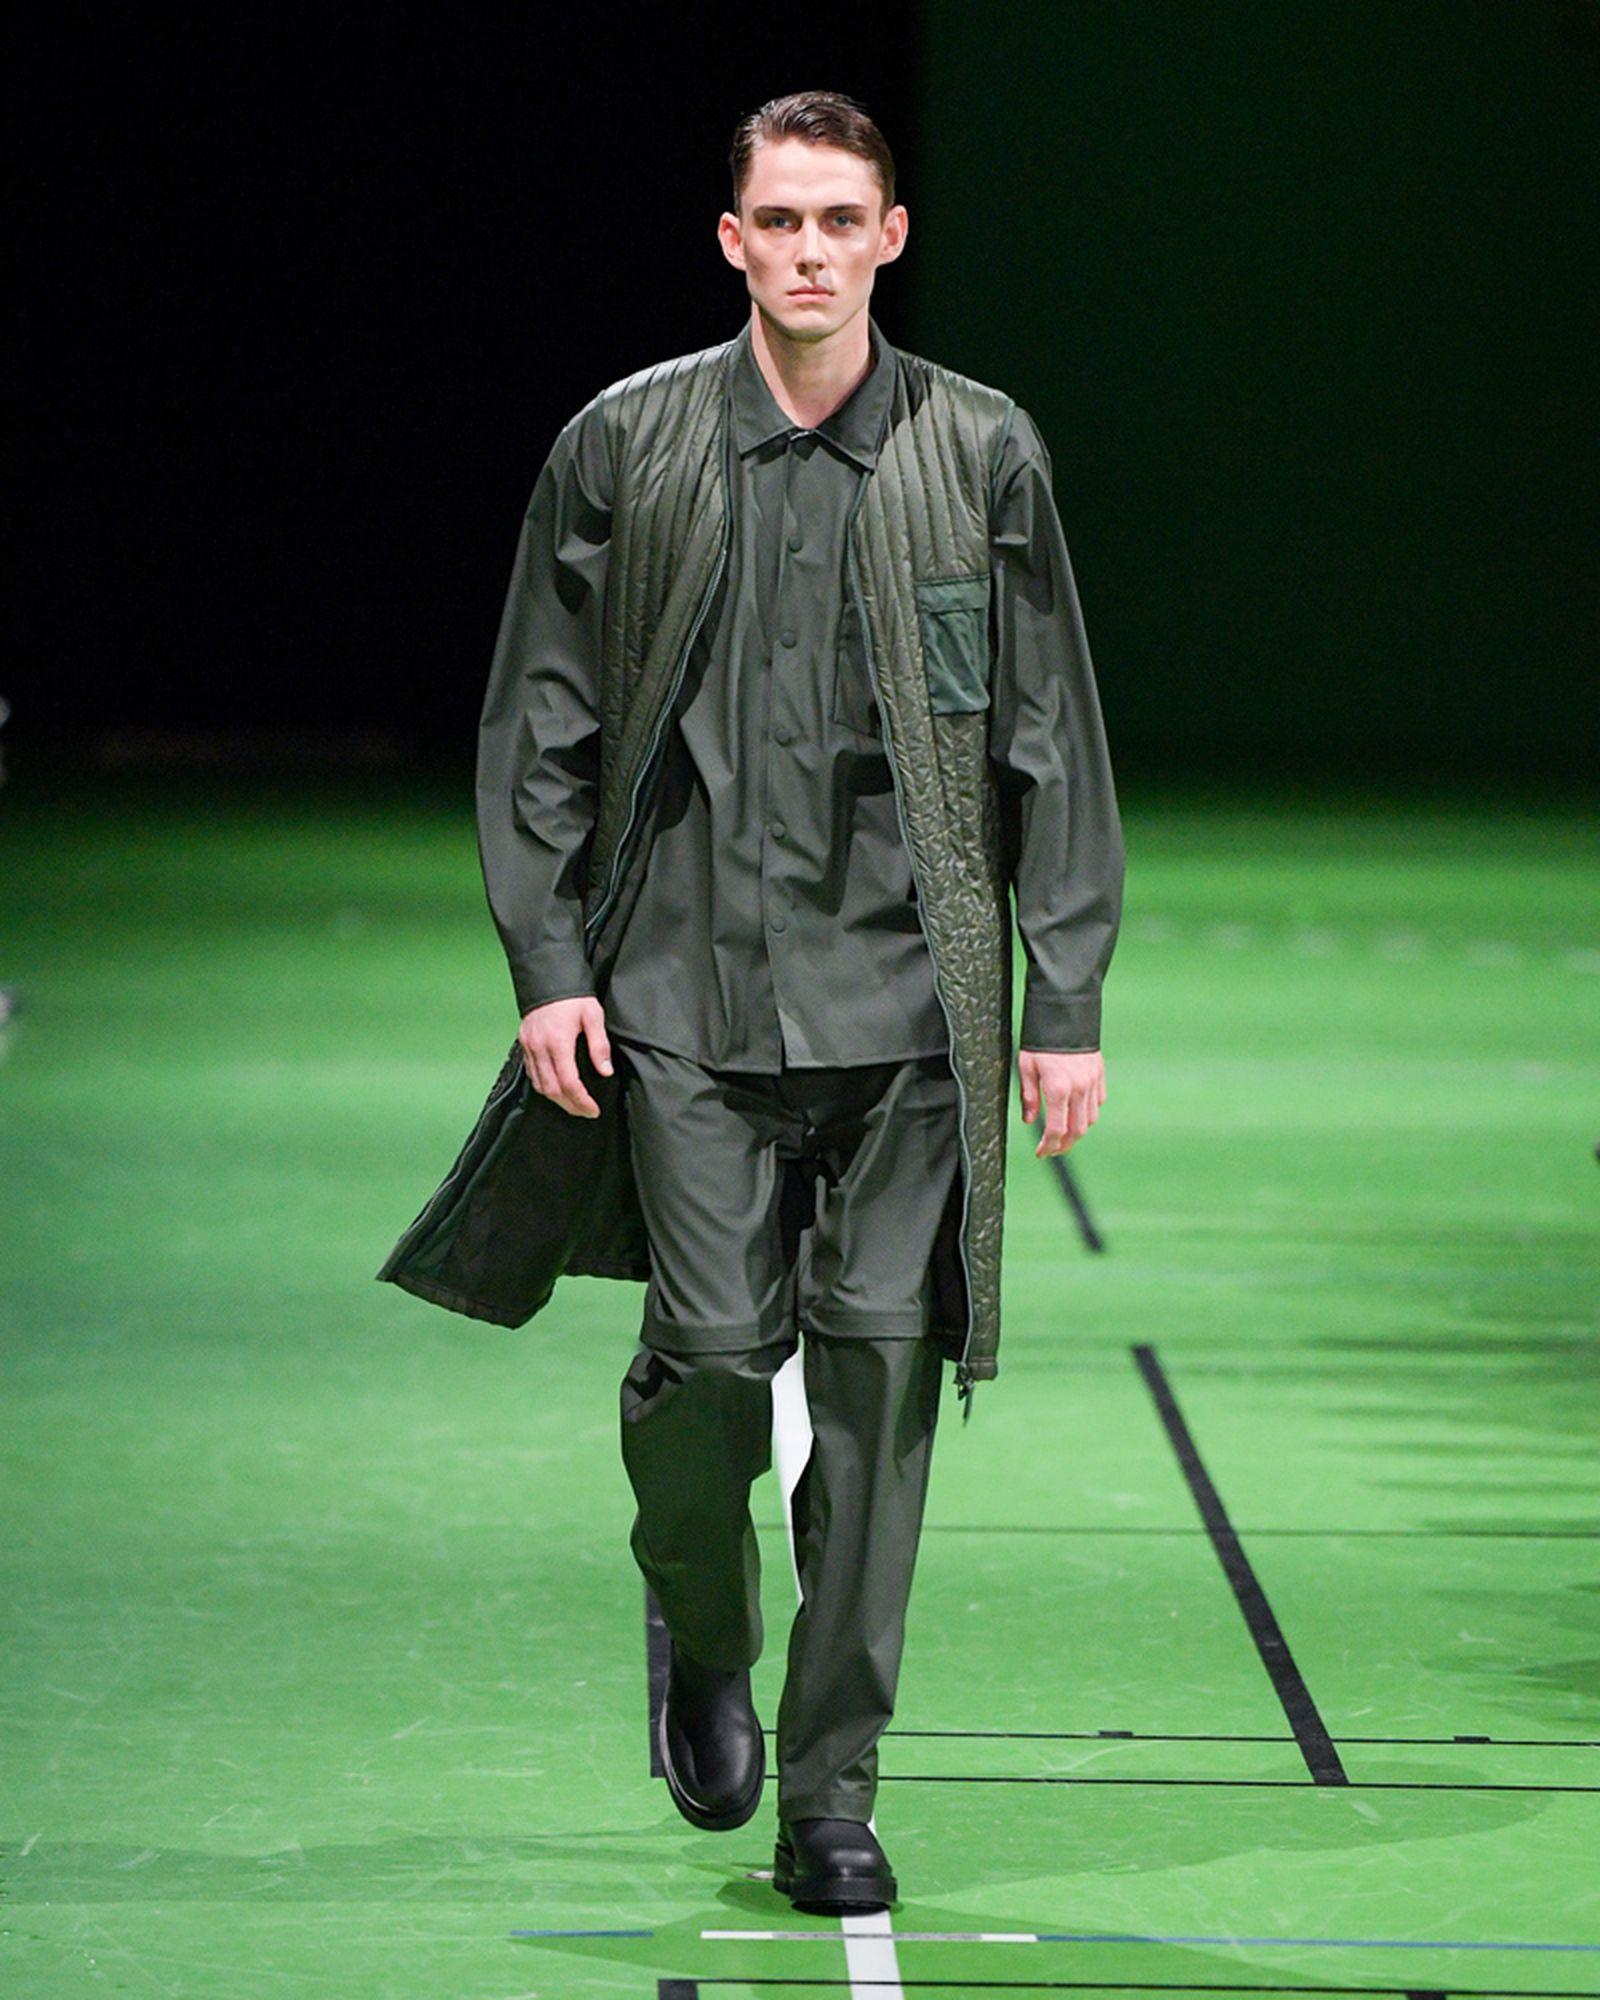 future-fashion-week-copenhagen-rains-3